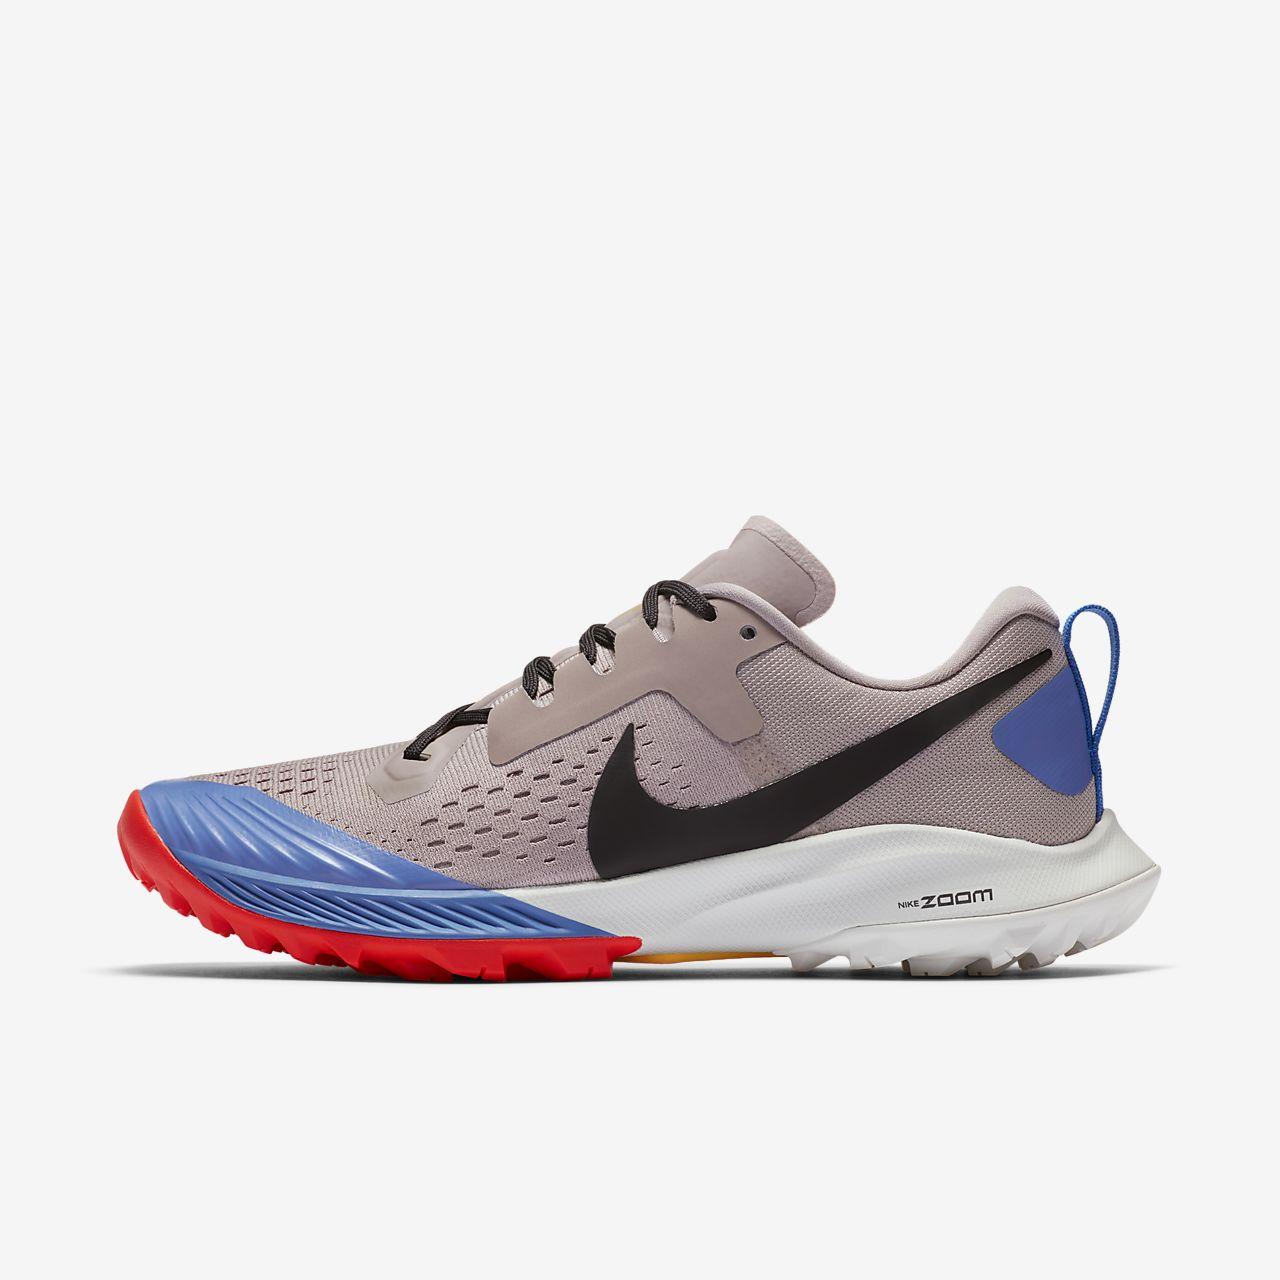 Nike Air Zoom Terra Kiger 5 Zapatillas de running para trail - Mujer